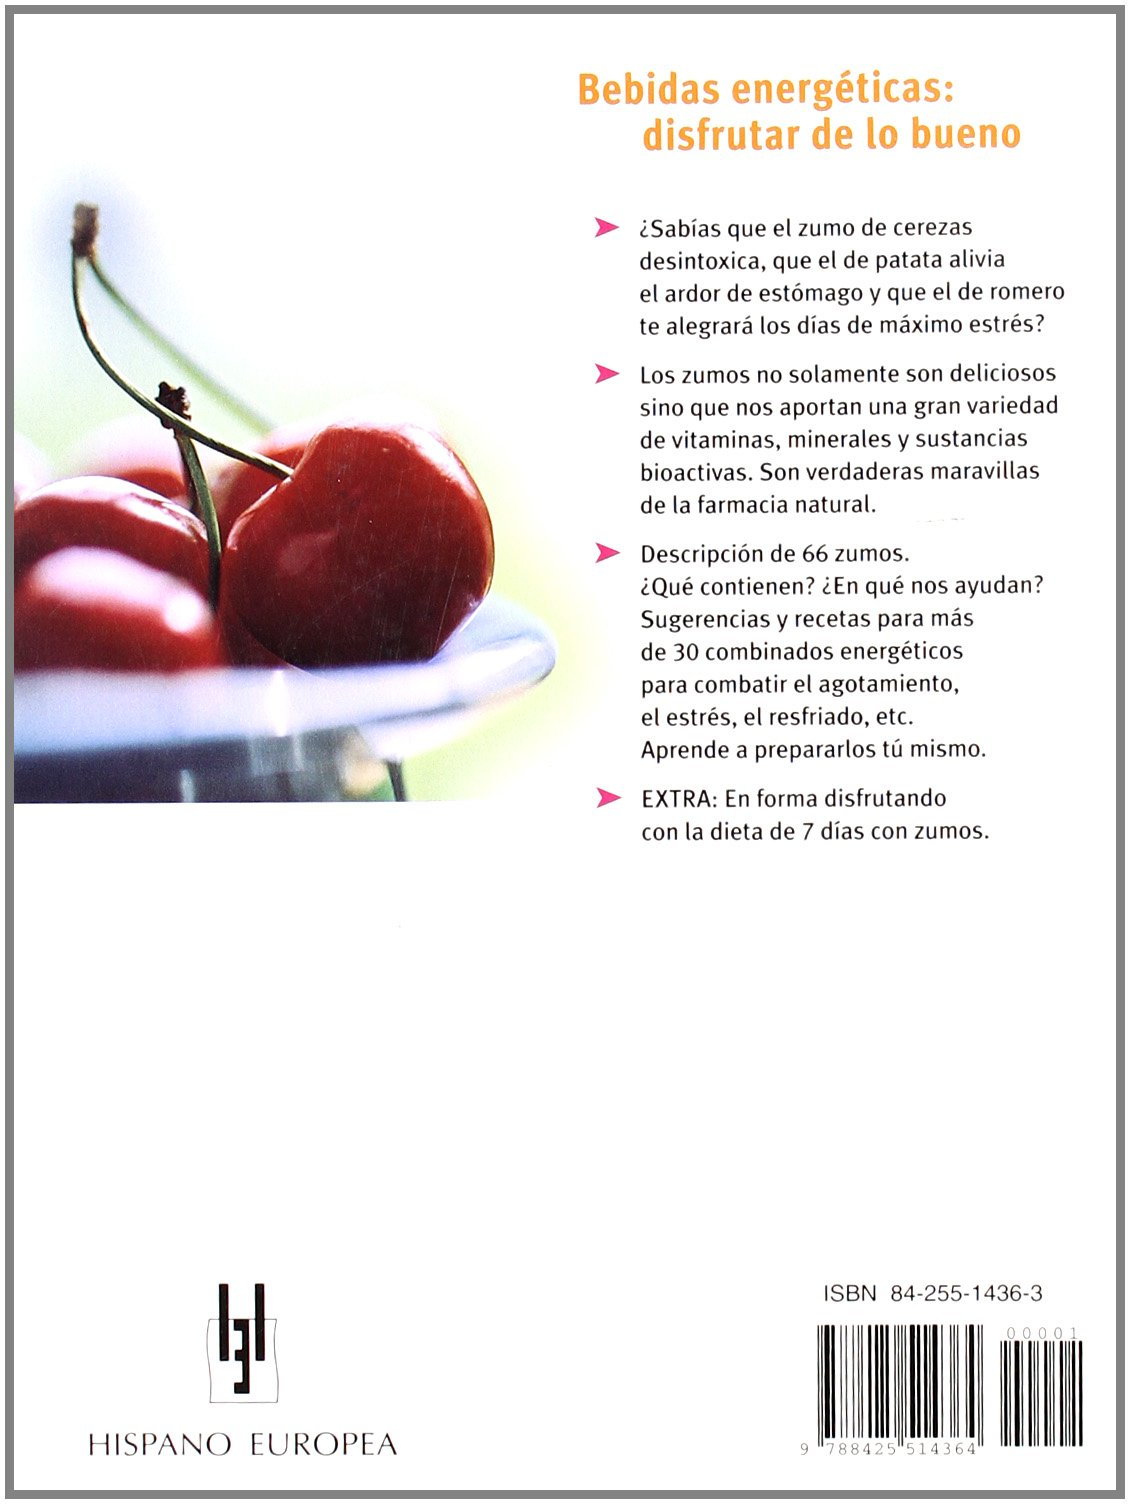 Zumos y bebidas saludables / Health food juices (Spanish Edition): Jochen G. Bielefeld: 9788425514364: Amazon.com: Books